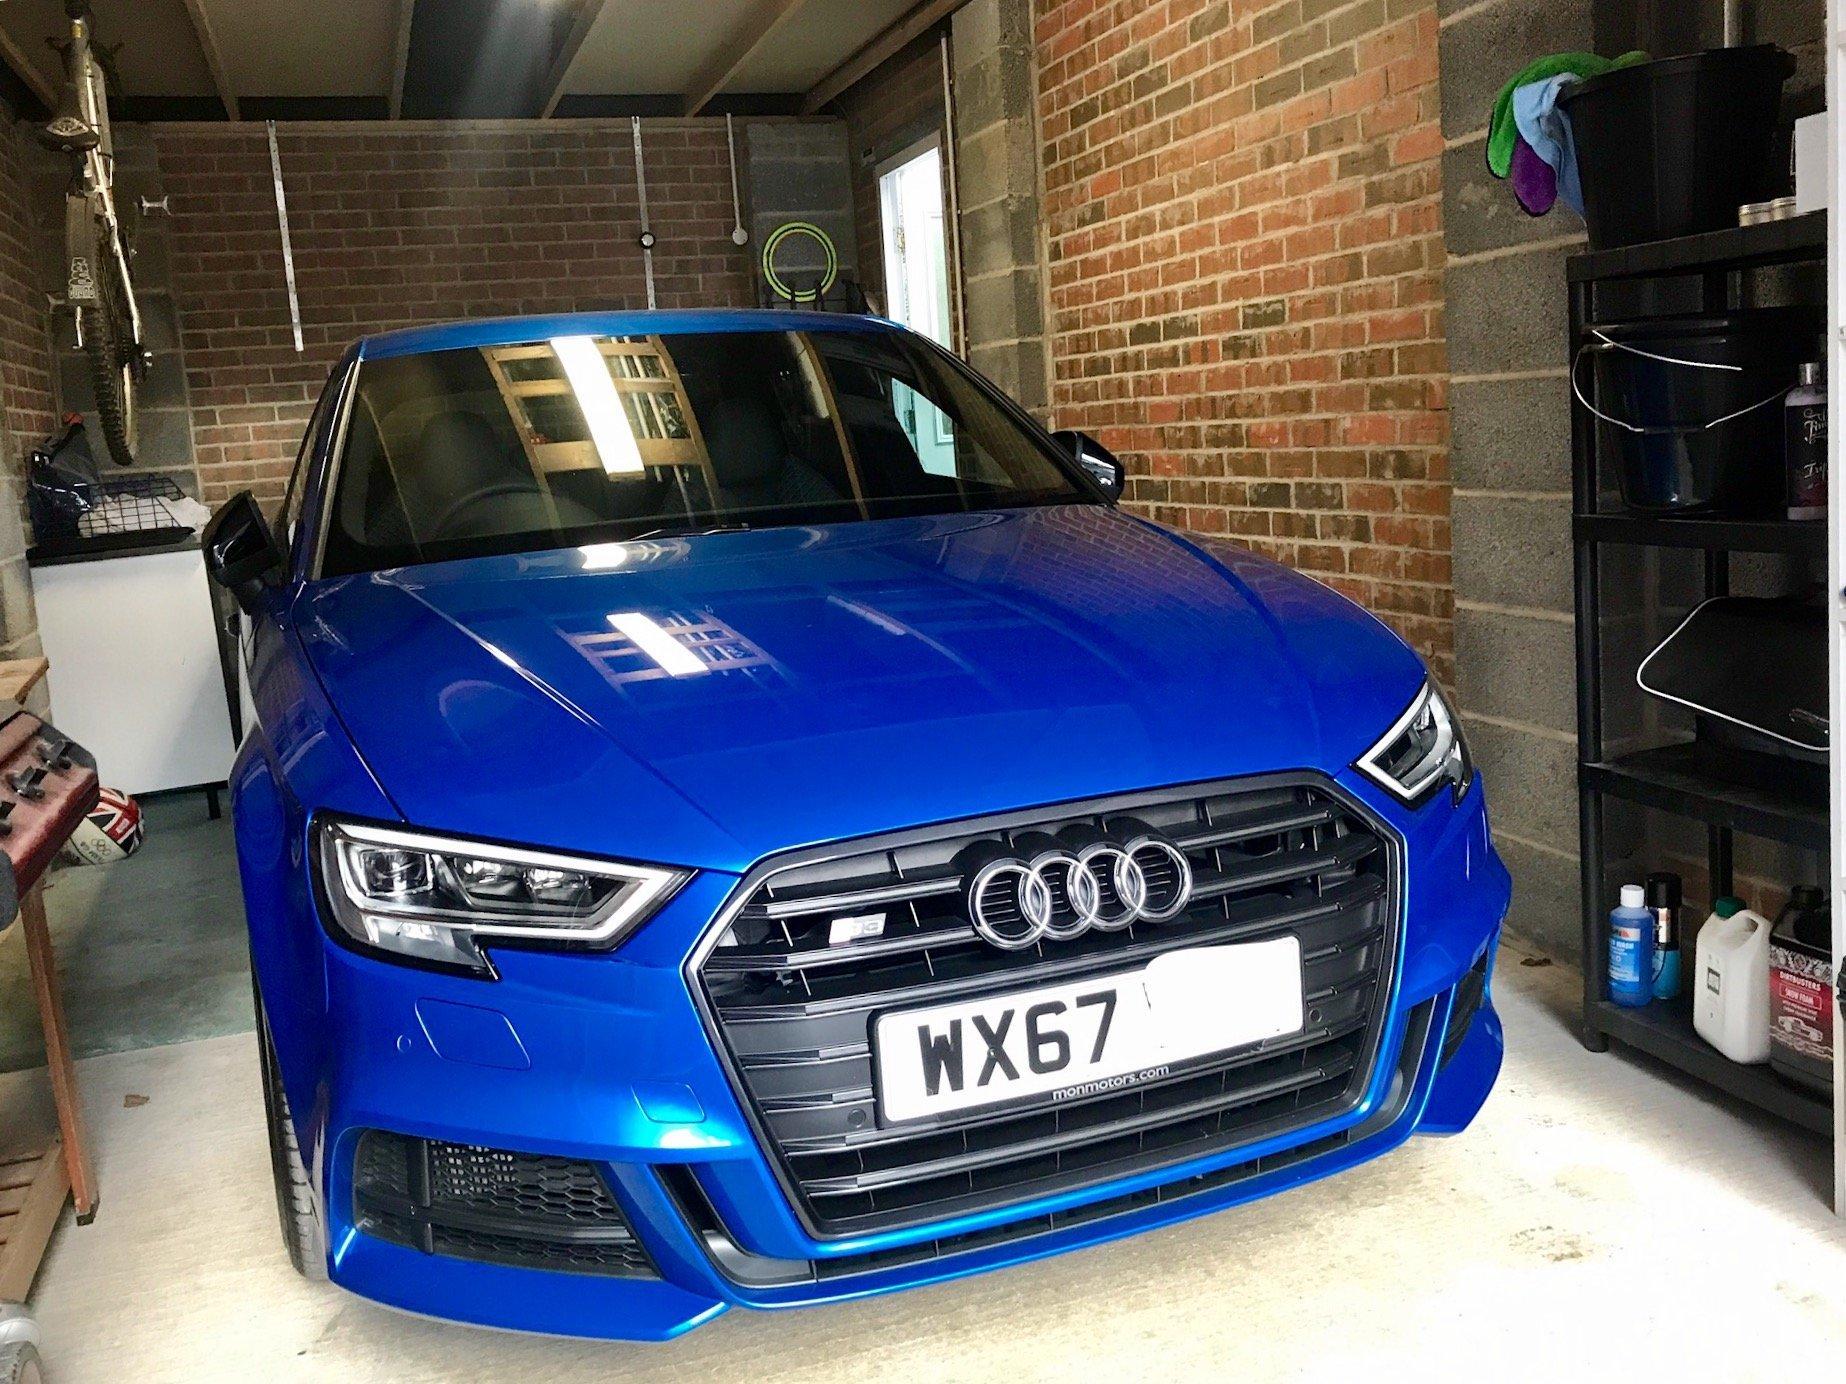 Firmware updates   | Audi-Sport net